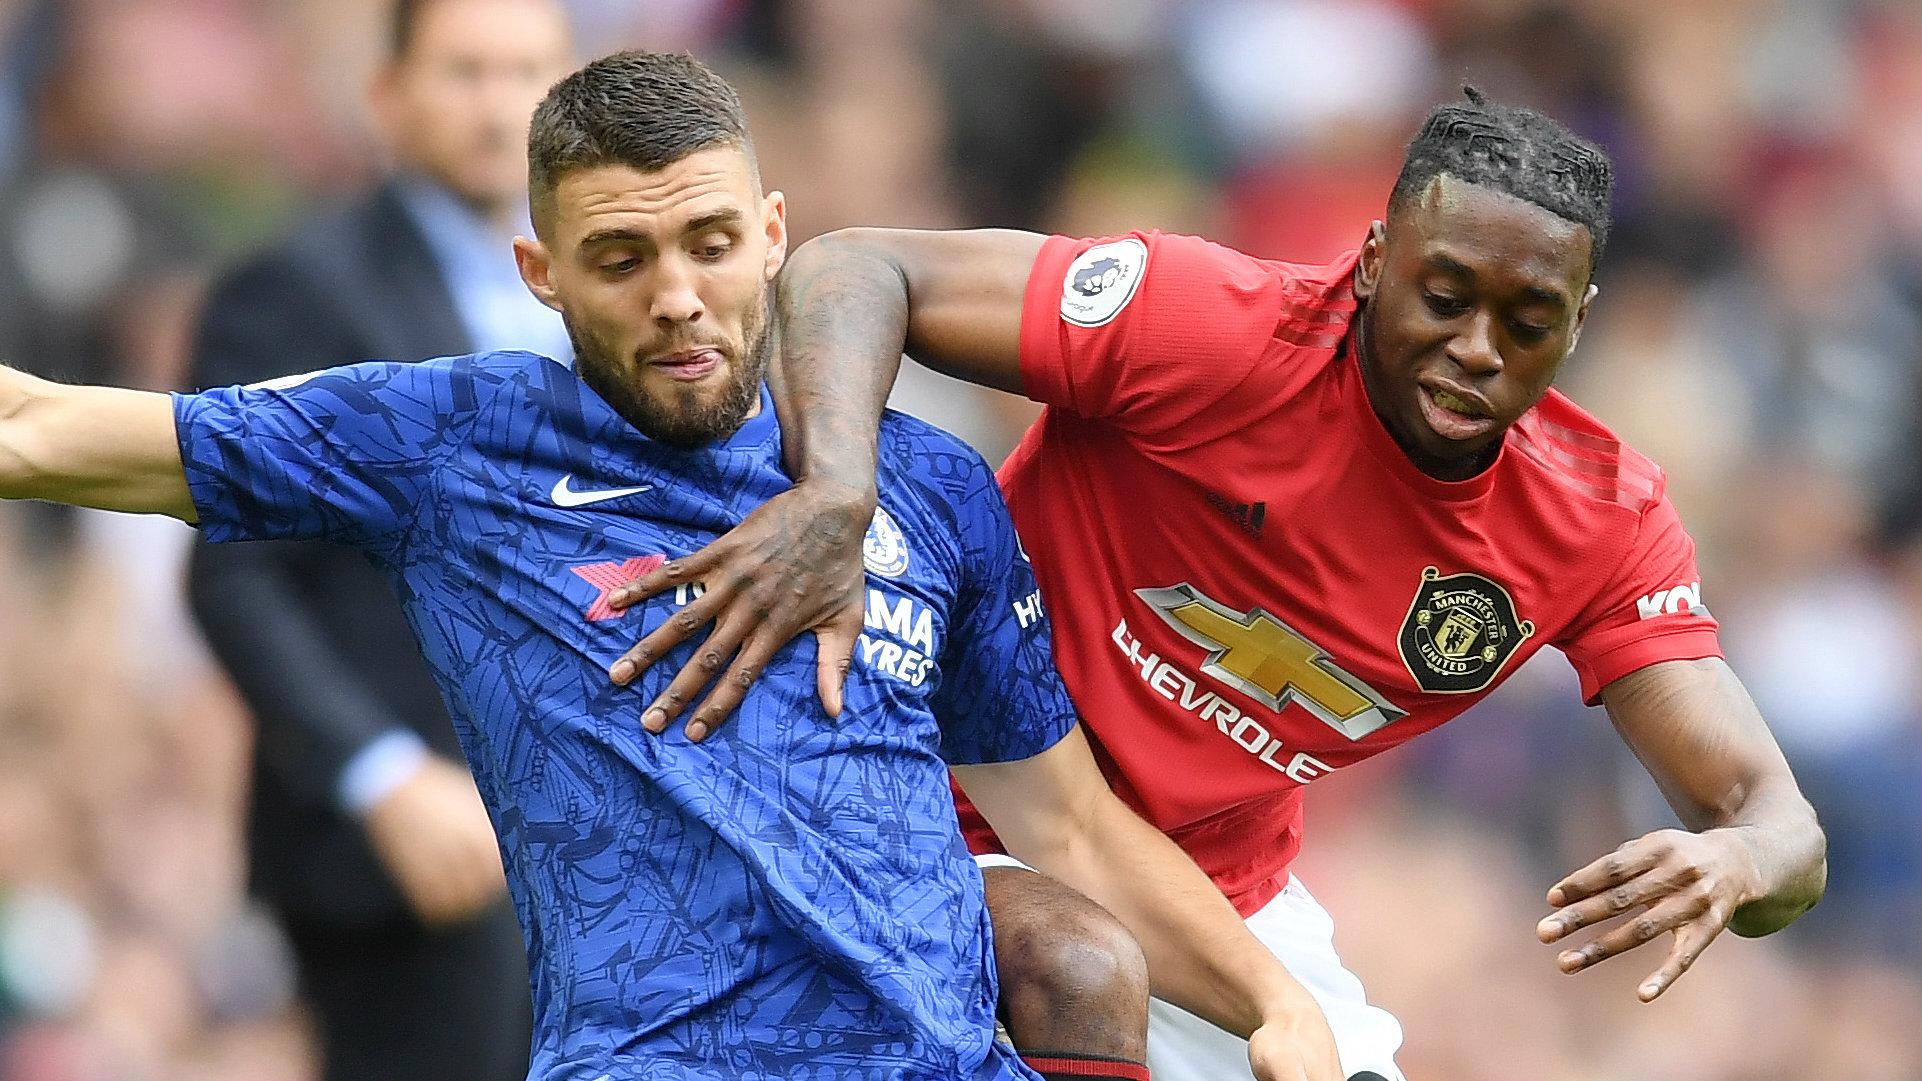 Aaron Wan-Bissaka Mateo Kovacic Man Utd vs Chelsea 2019-20